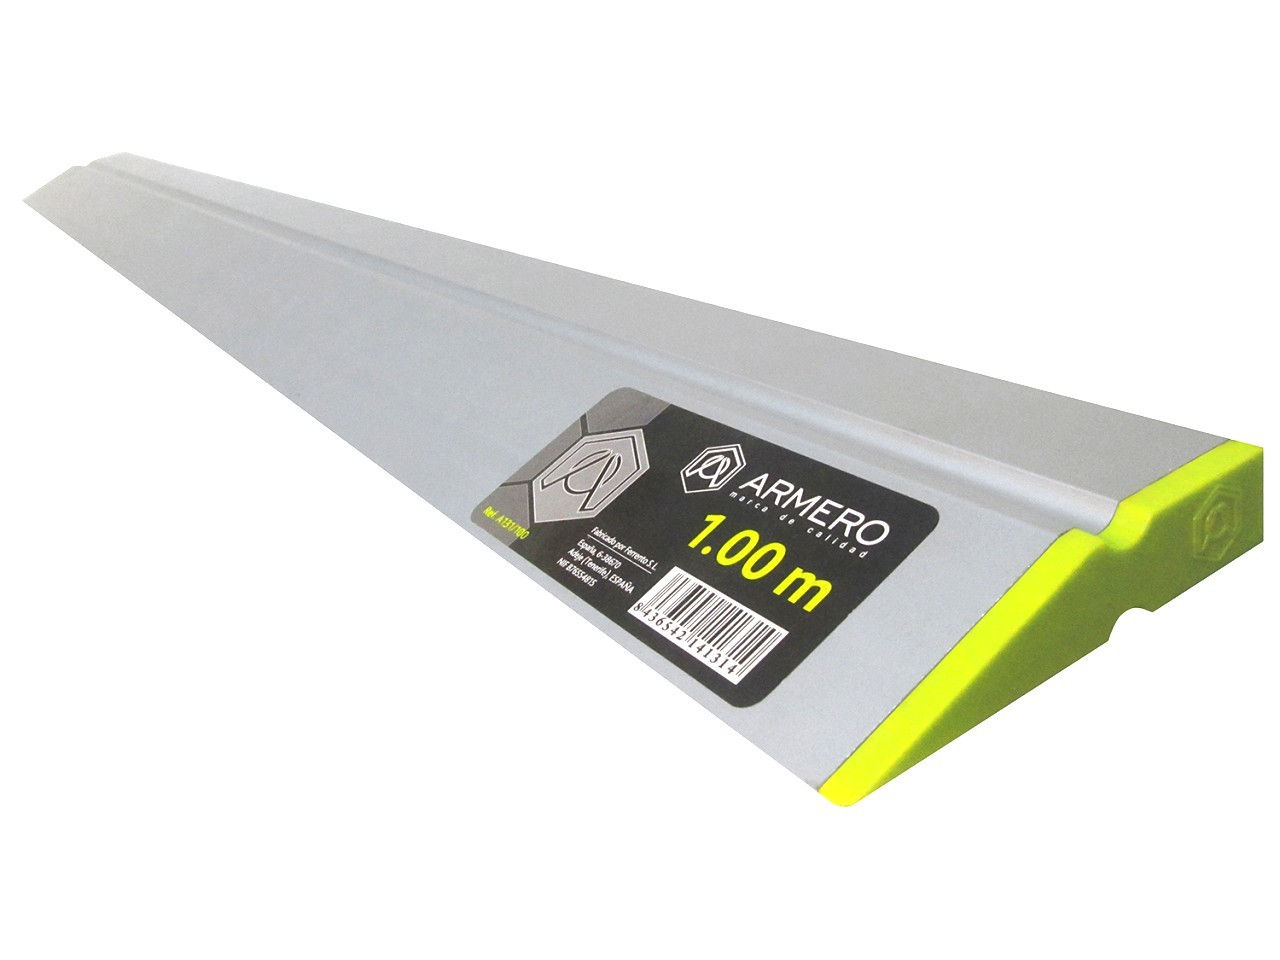 Правило алюминиевое A131/100, 1.0м